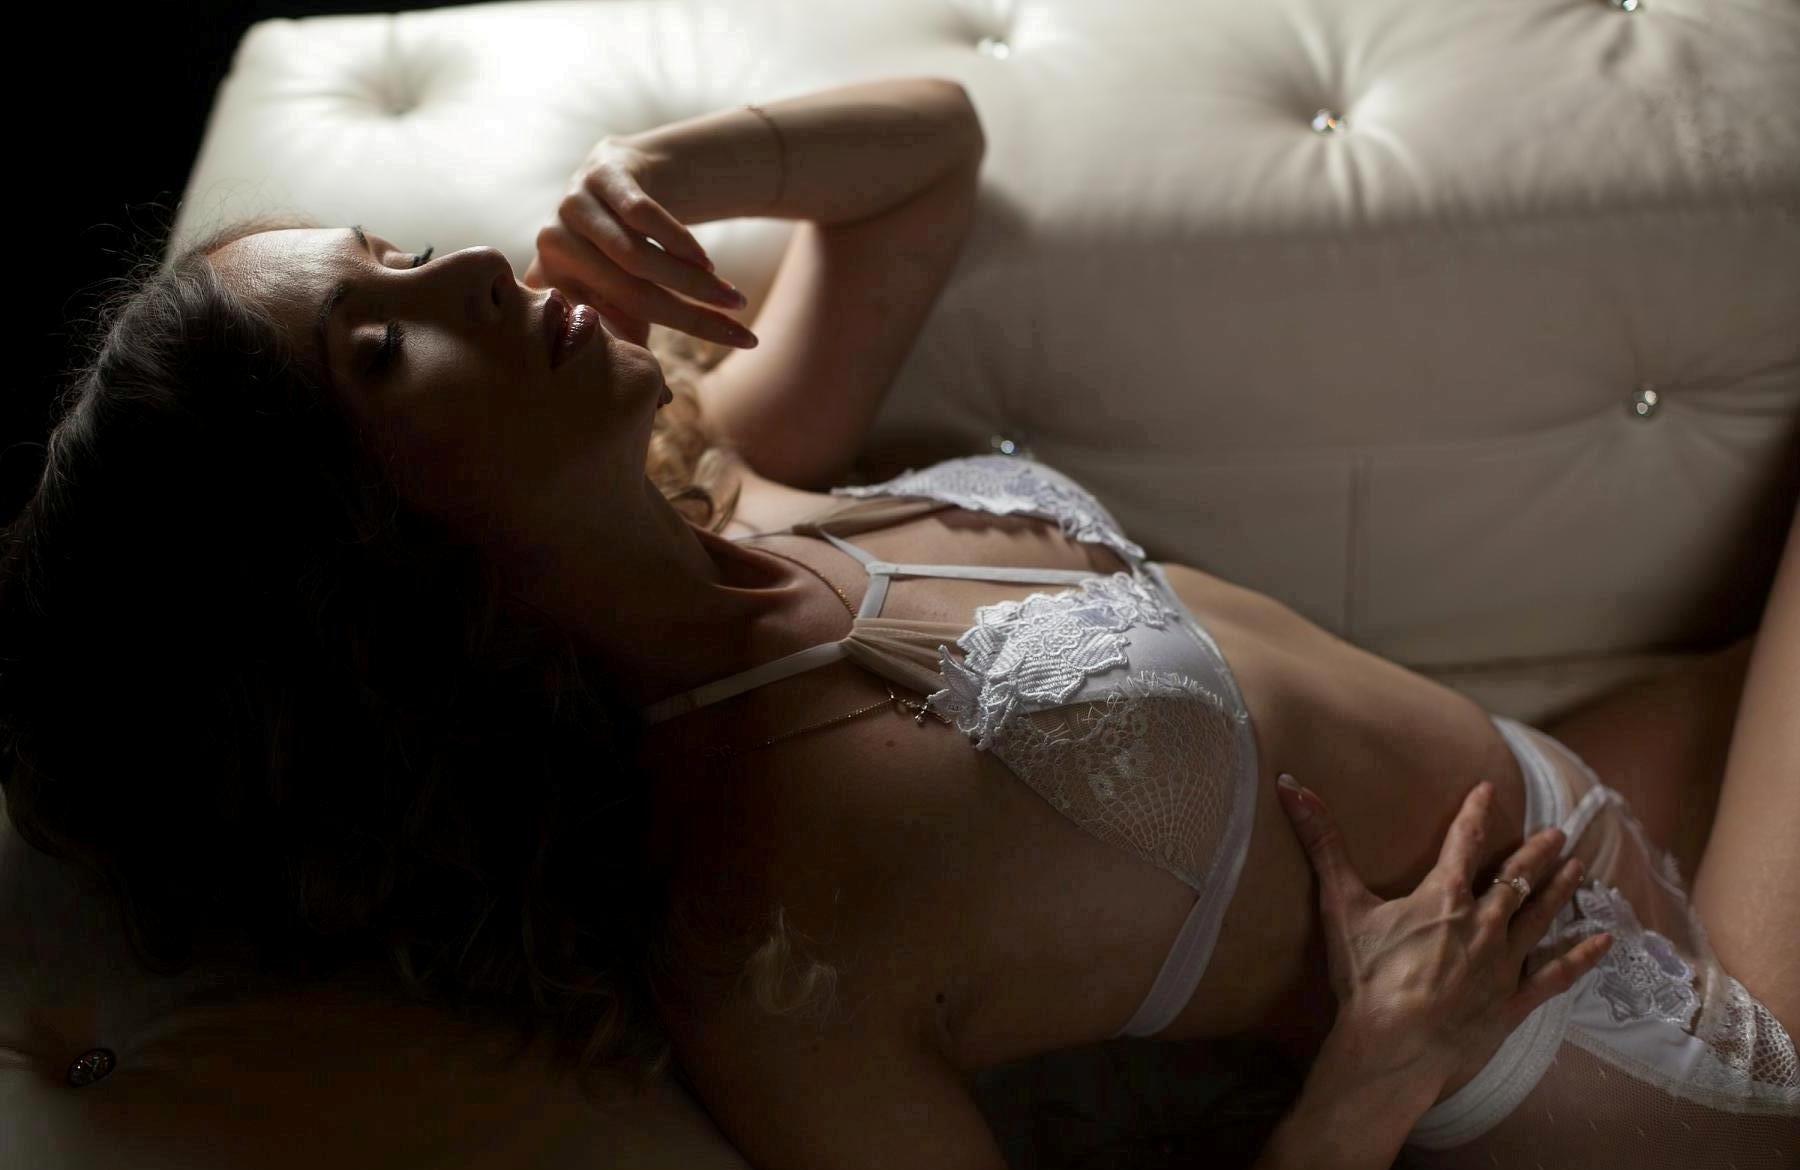 prostitutki-ekaterinburga-bez-prezervativa-samie-krutie-siski-v-porno